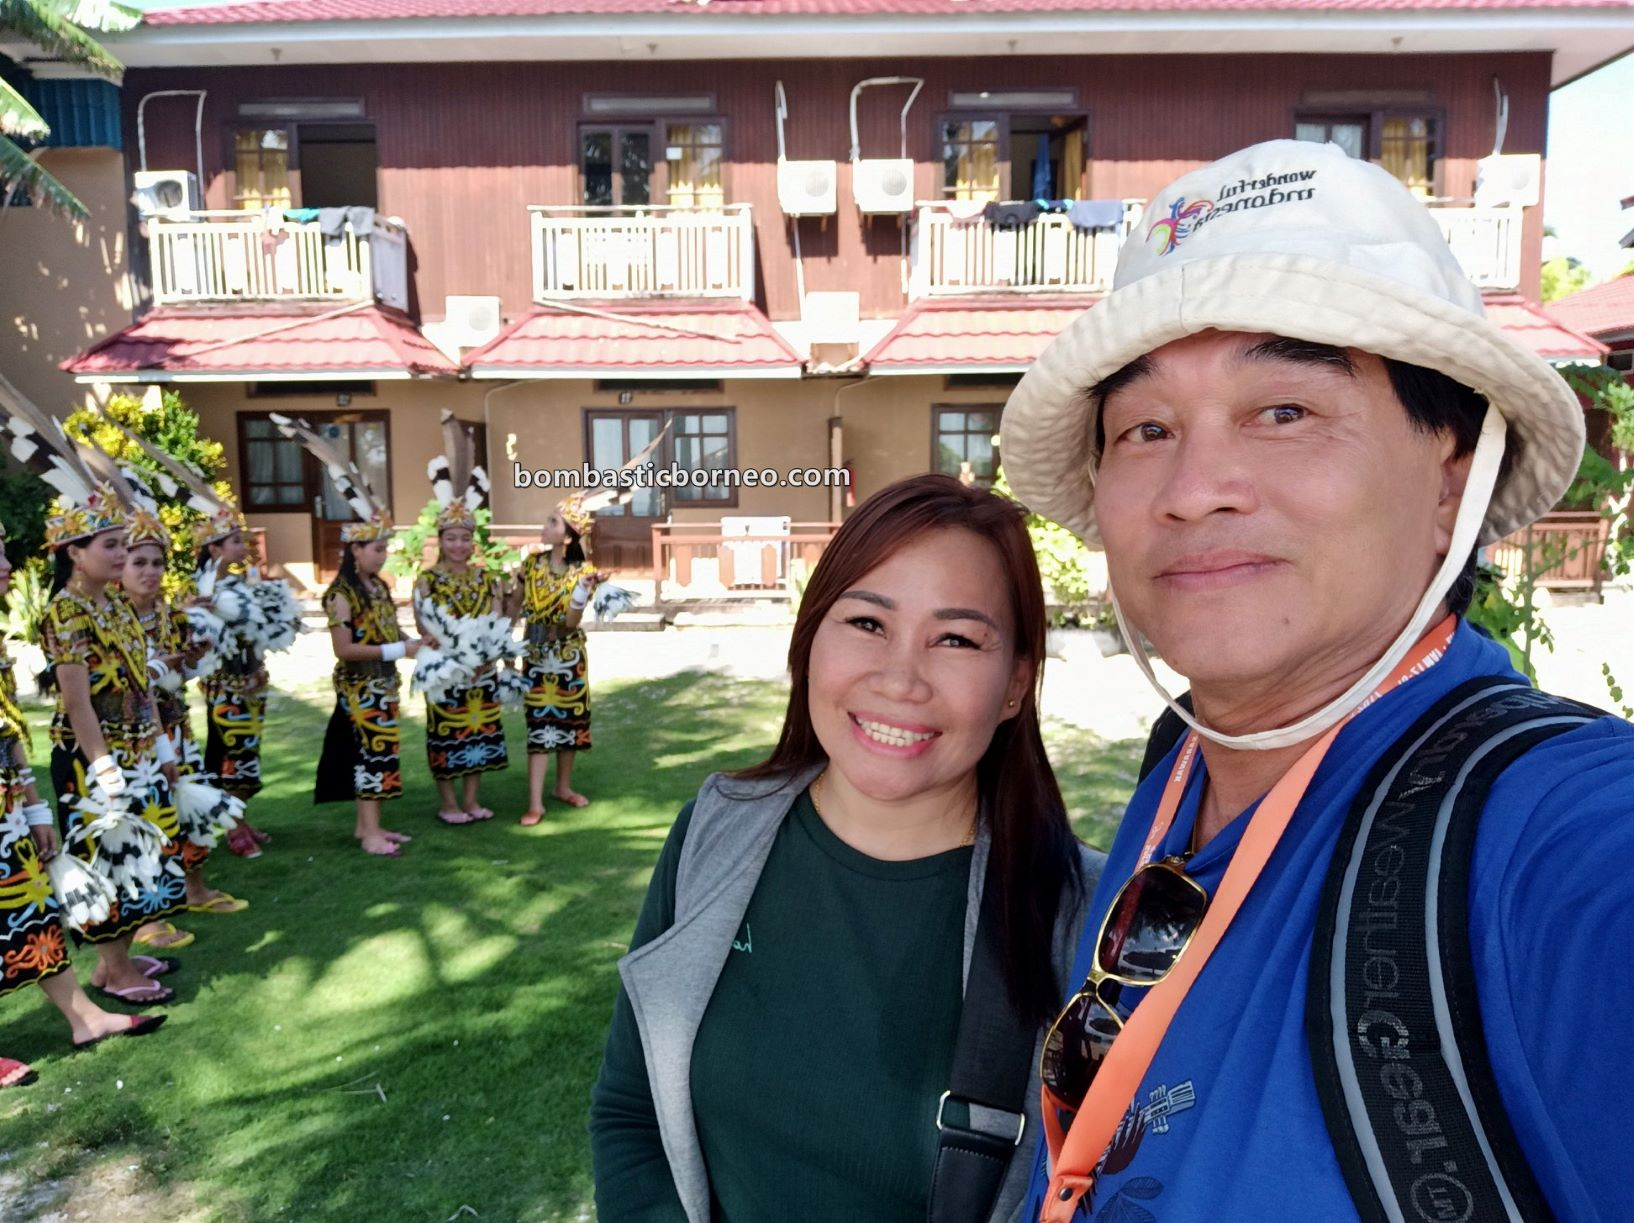 Familiarisation trip, Kepulauan Derawan, Pulau Derawan, exploration, vacation, Berau, Objek wisata, Pariwisata, Tourism, travel guide, Cross Border, Borneo, 探索婆罗洲游踪, 印尼东加里曼丹,